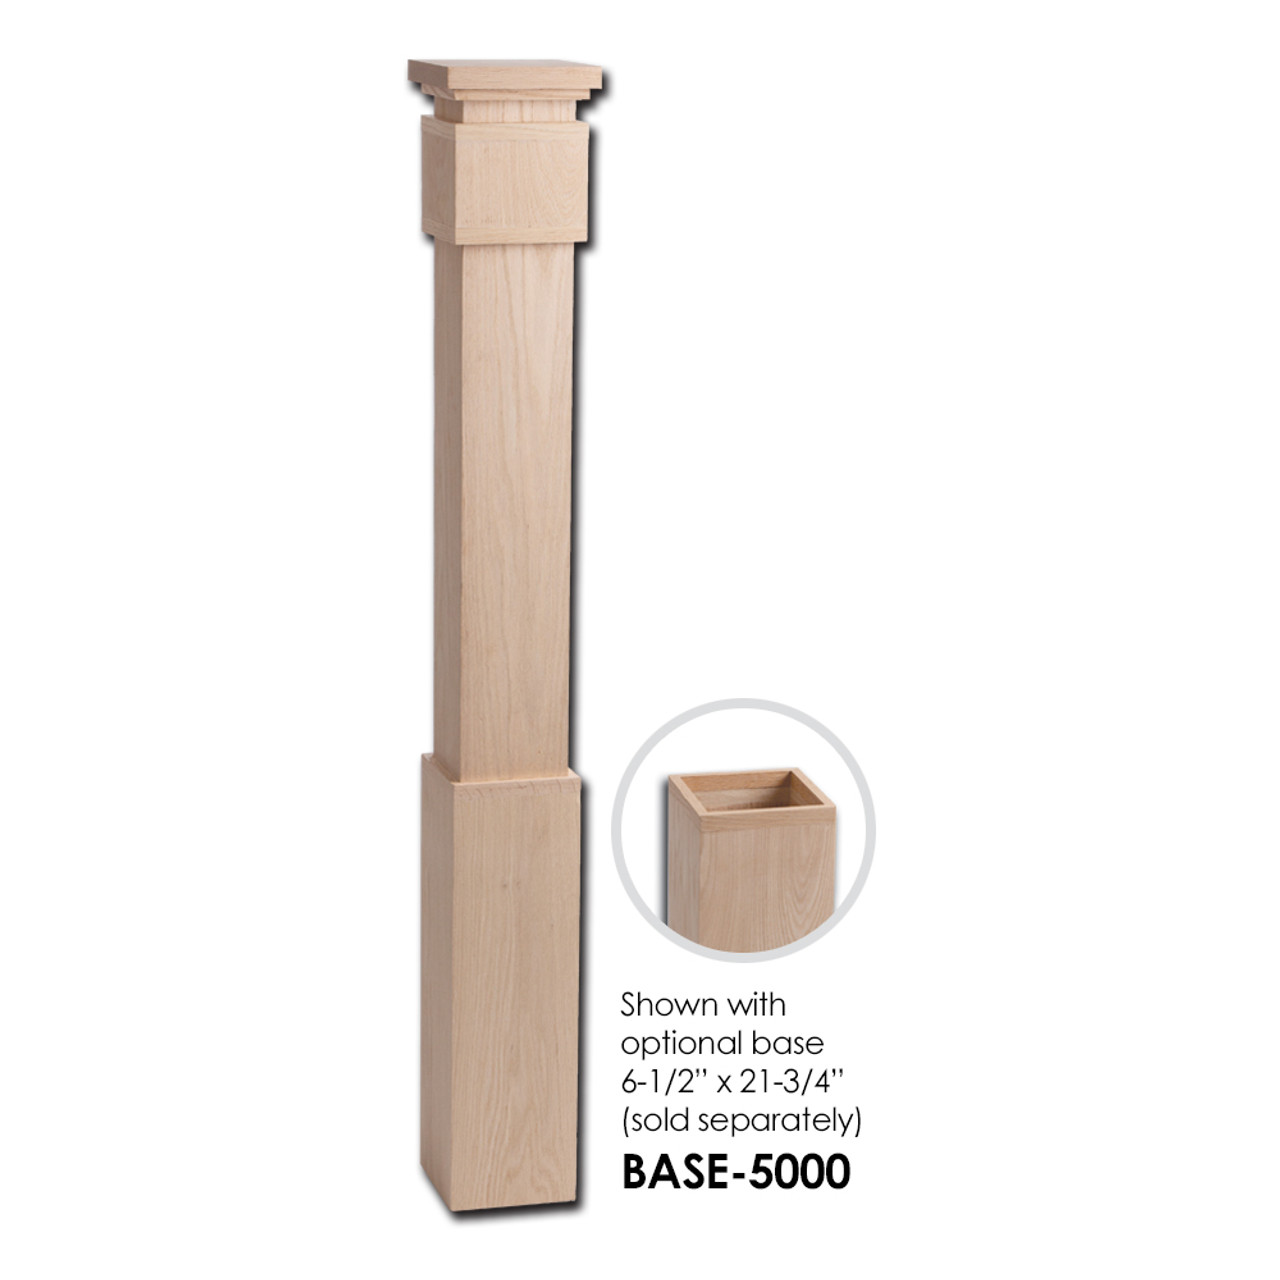 5400 Large Modern Newel Post With Optional Base Sleeve